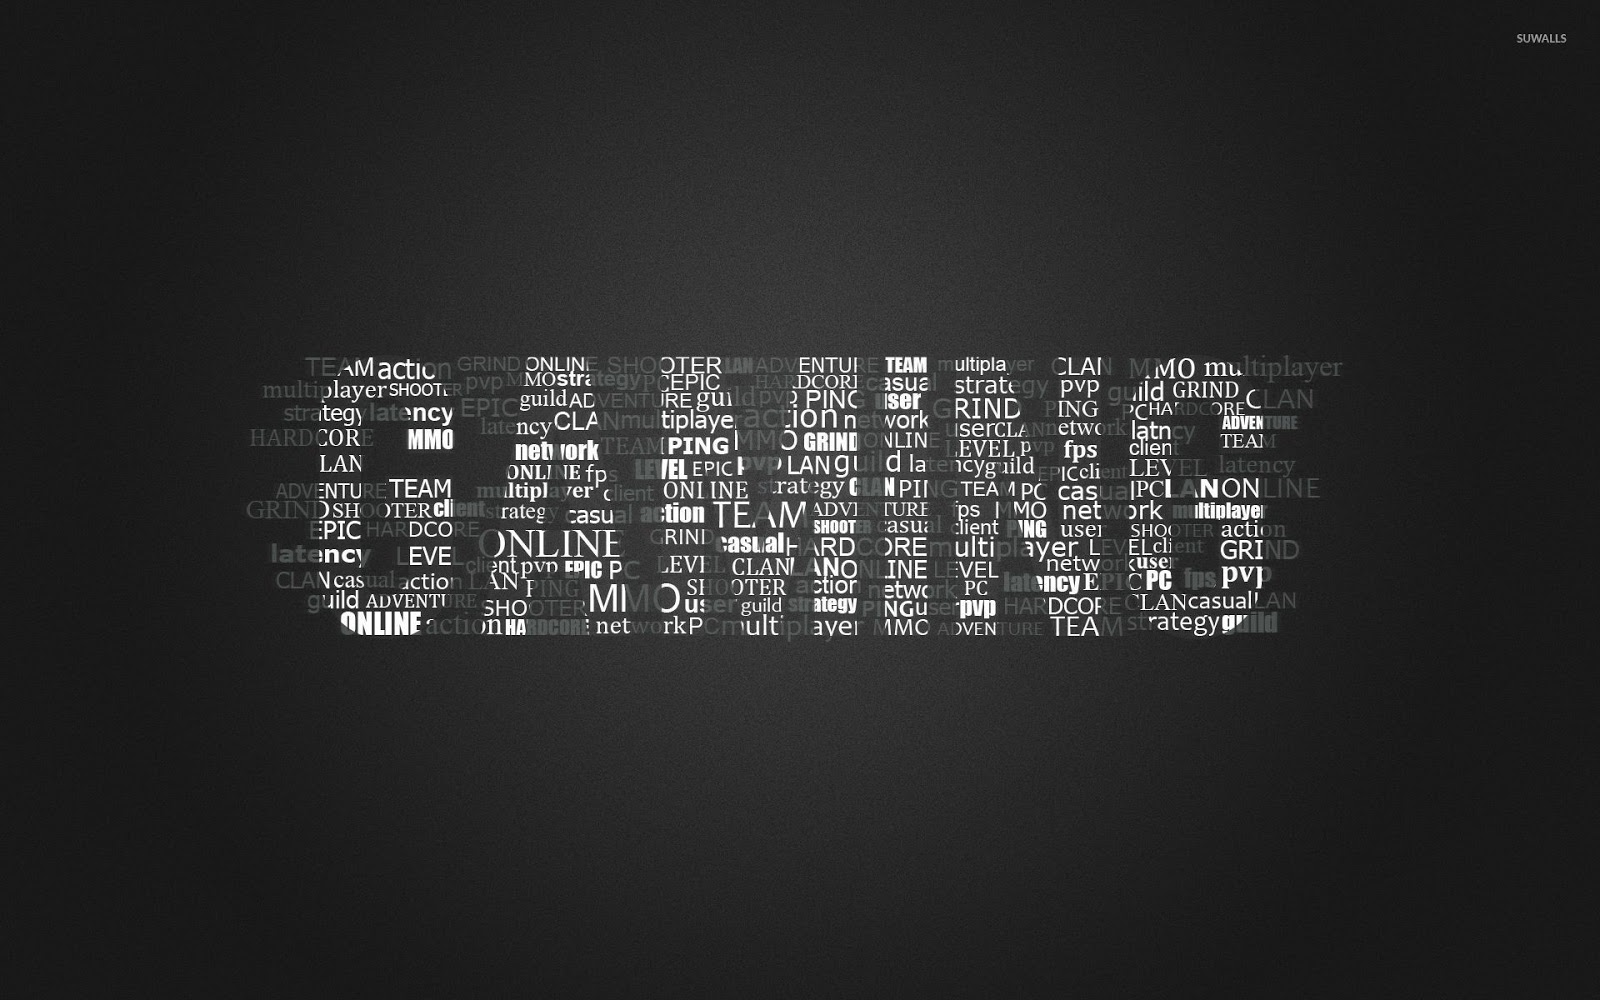 Gaming Wallpaper S 2018 4k Full Hd Hd Download For Free